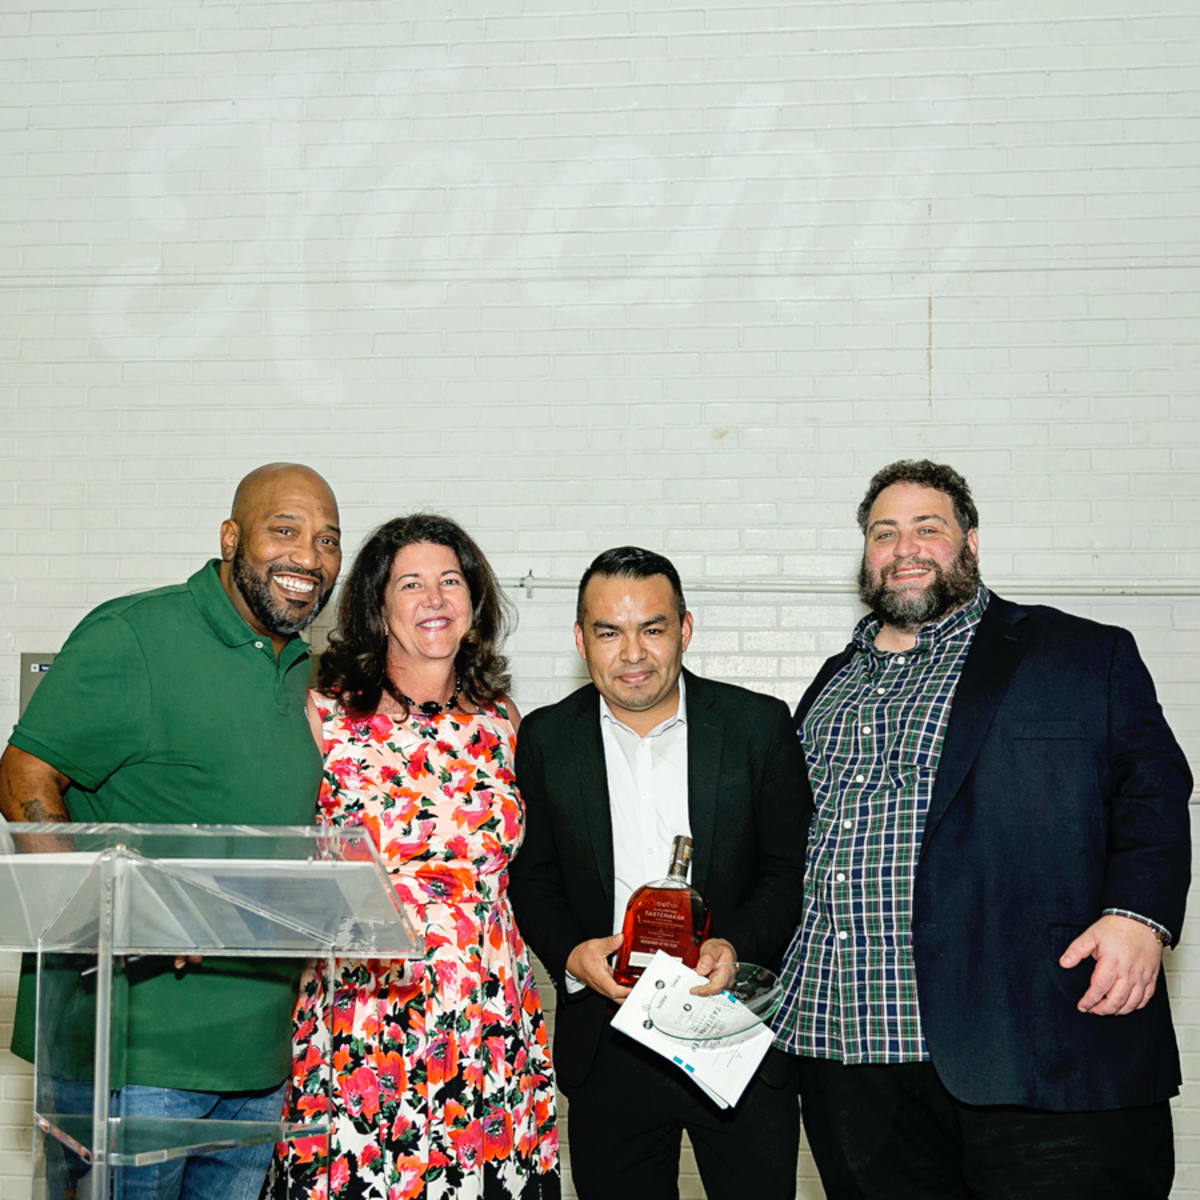 Tastemaker Awards 2018 Bun B, Tracey Vaught, Eric Sandler